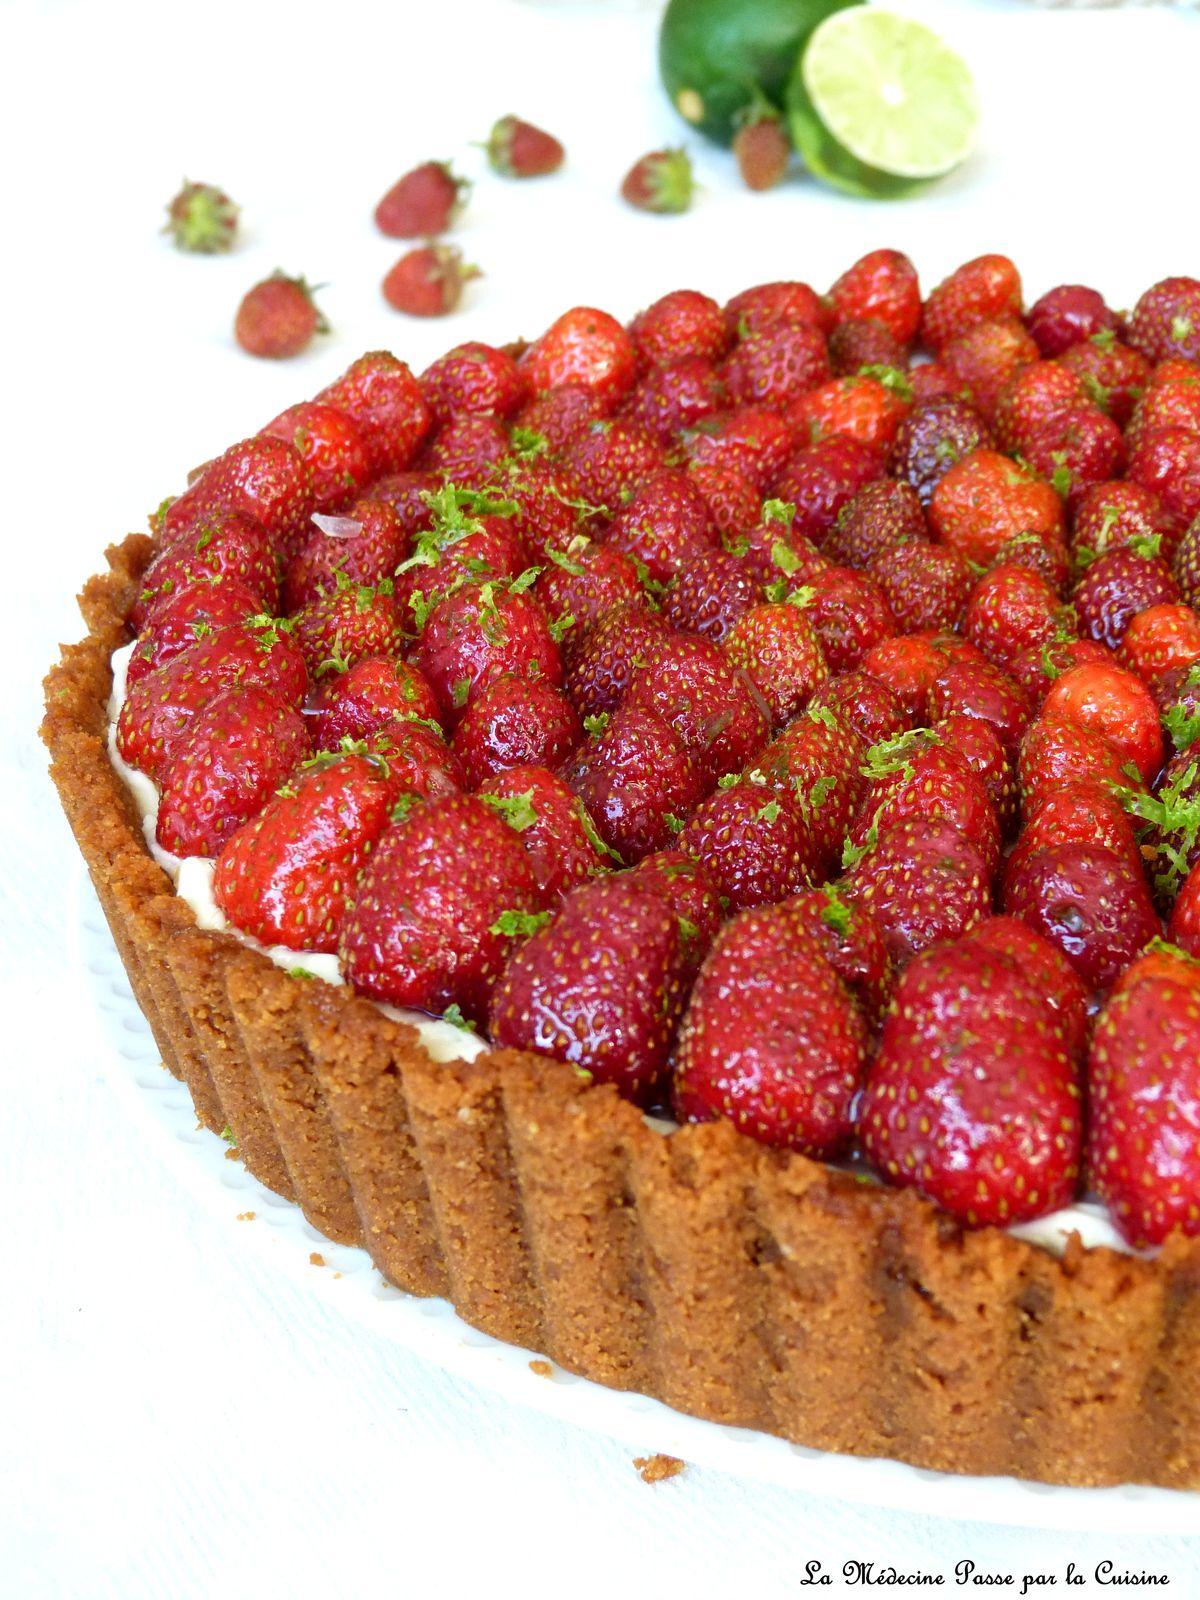 Cheesecake aux fraises, vanille de Tahiti et citron vert